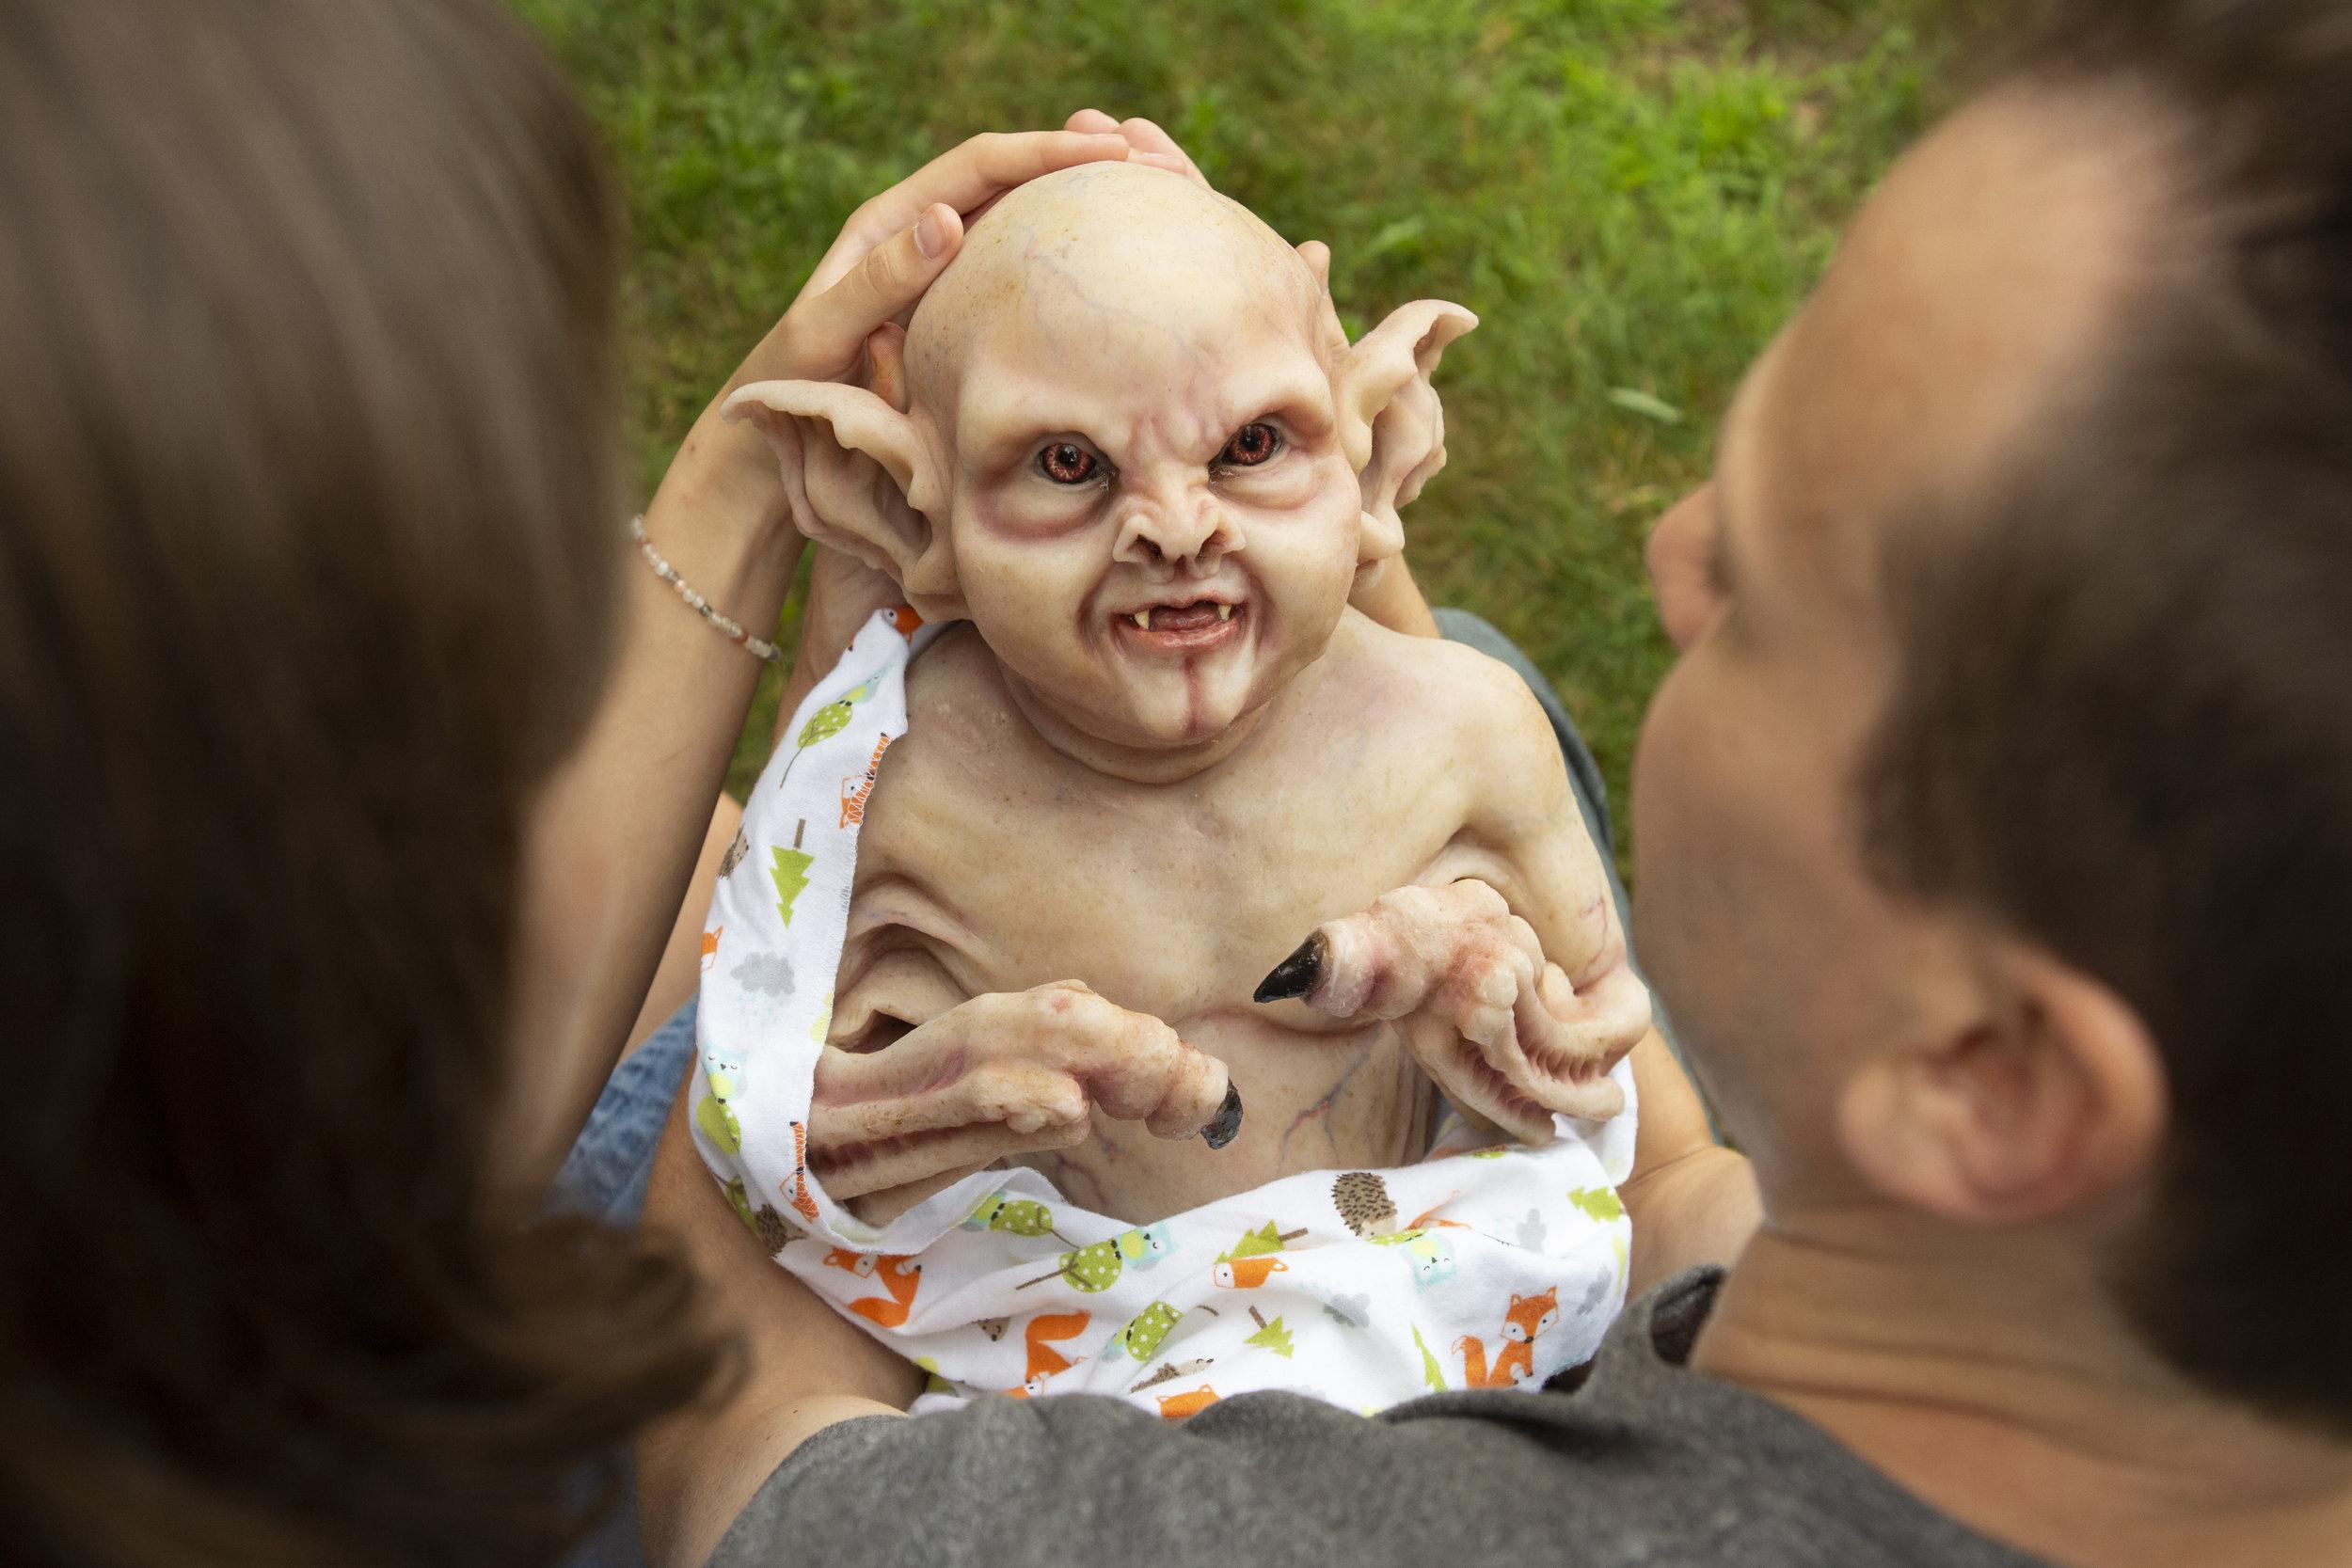 Newborn Vampire  | Newborn photoshoot | Ravendark Creations Vampire Baby | Newborn Photoshoots | Alyssia Booth's Candid & Studio | www.abcandidstudio.com